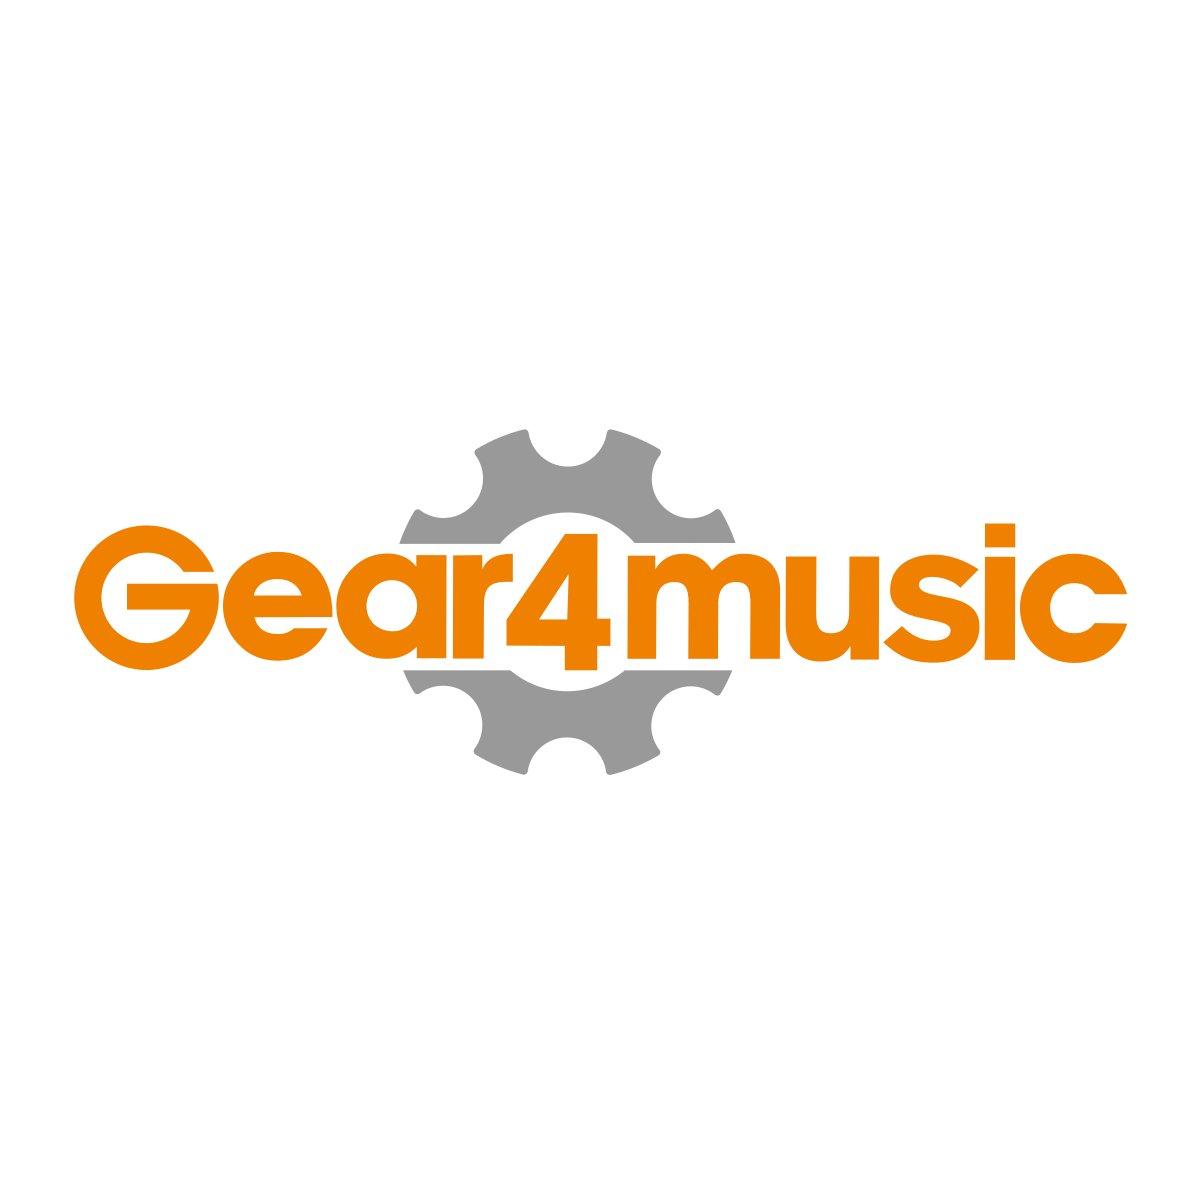 48f312943526 Guitarra Acústica Dreadnought de 12 Cuerdas Gear4music - Negro ...